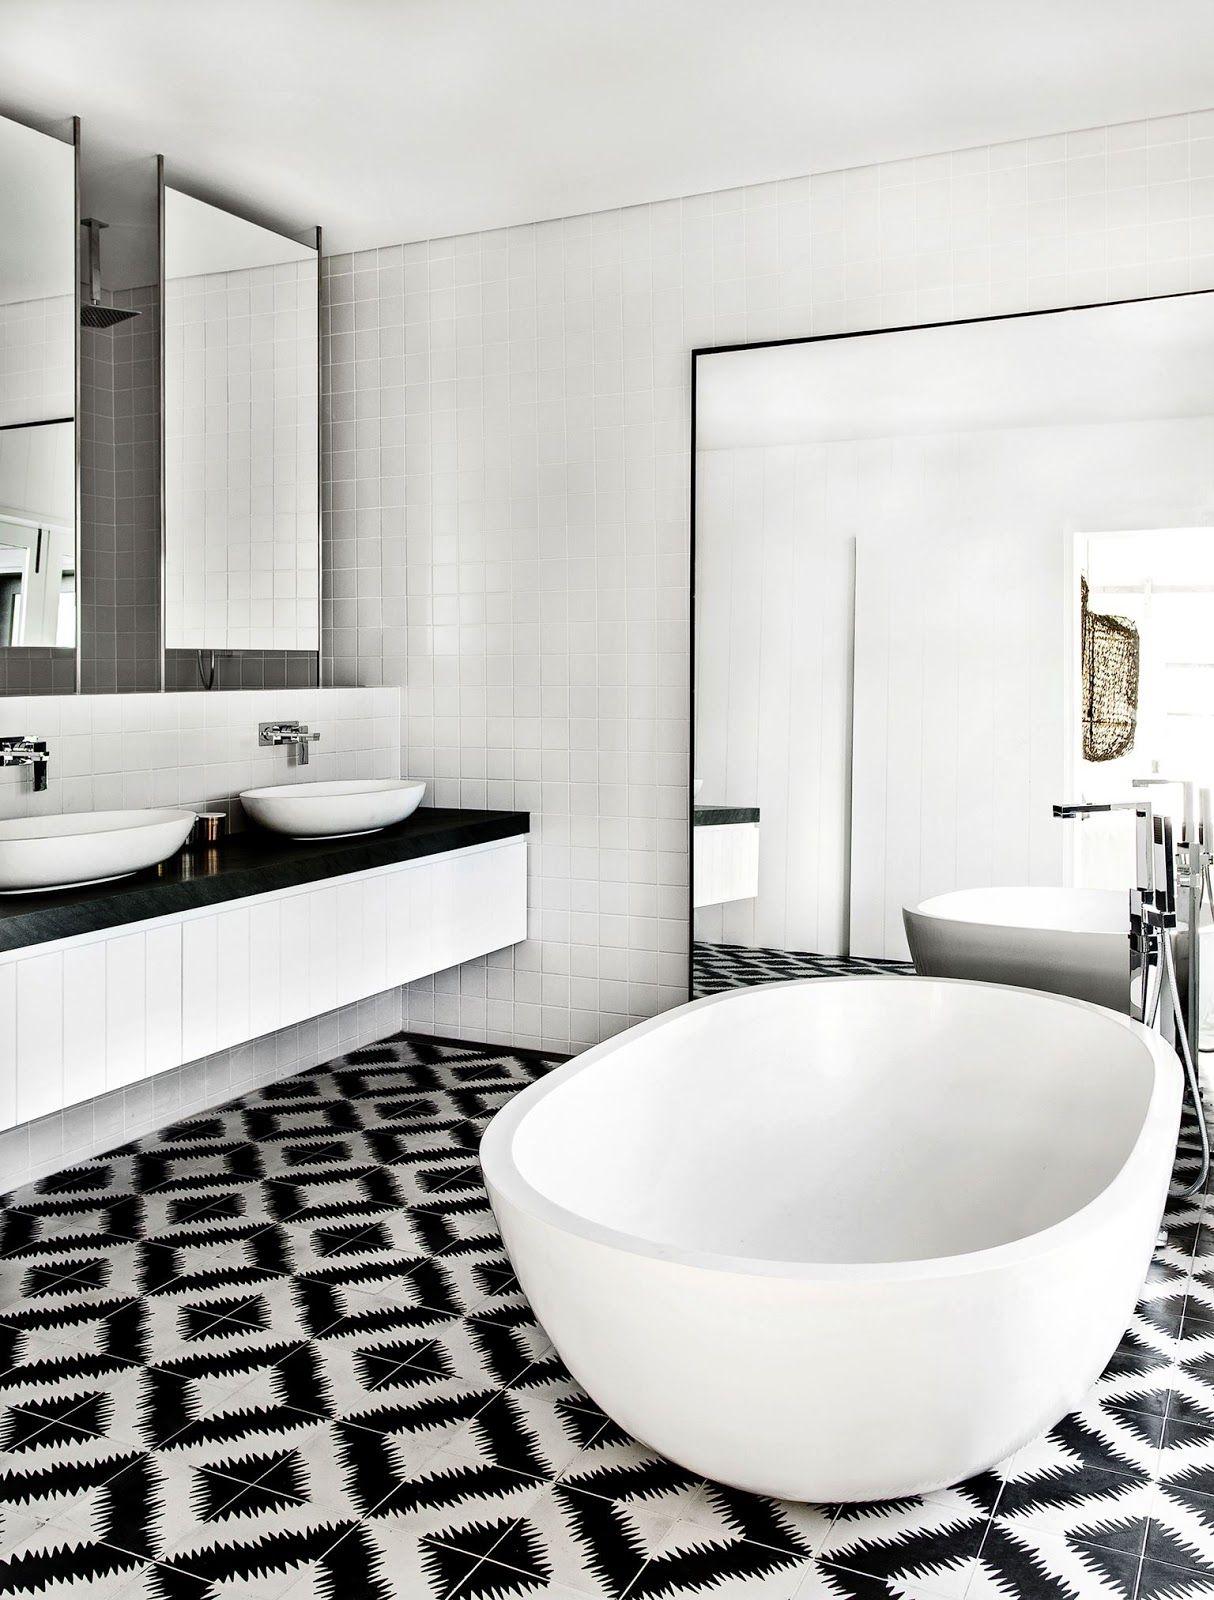 Modern bathroom design ideas | Black and white bathroom designs with ...